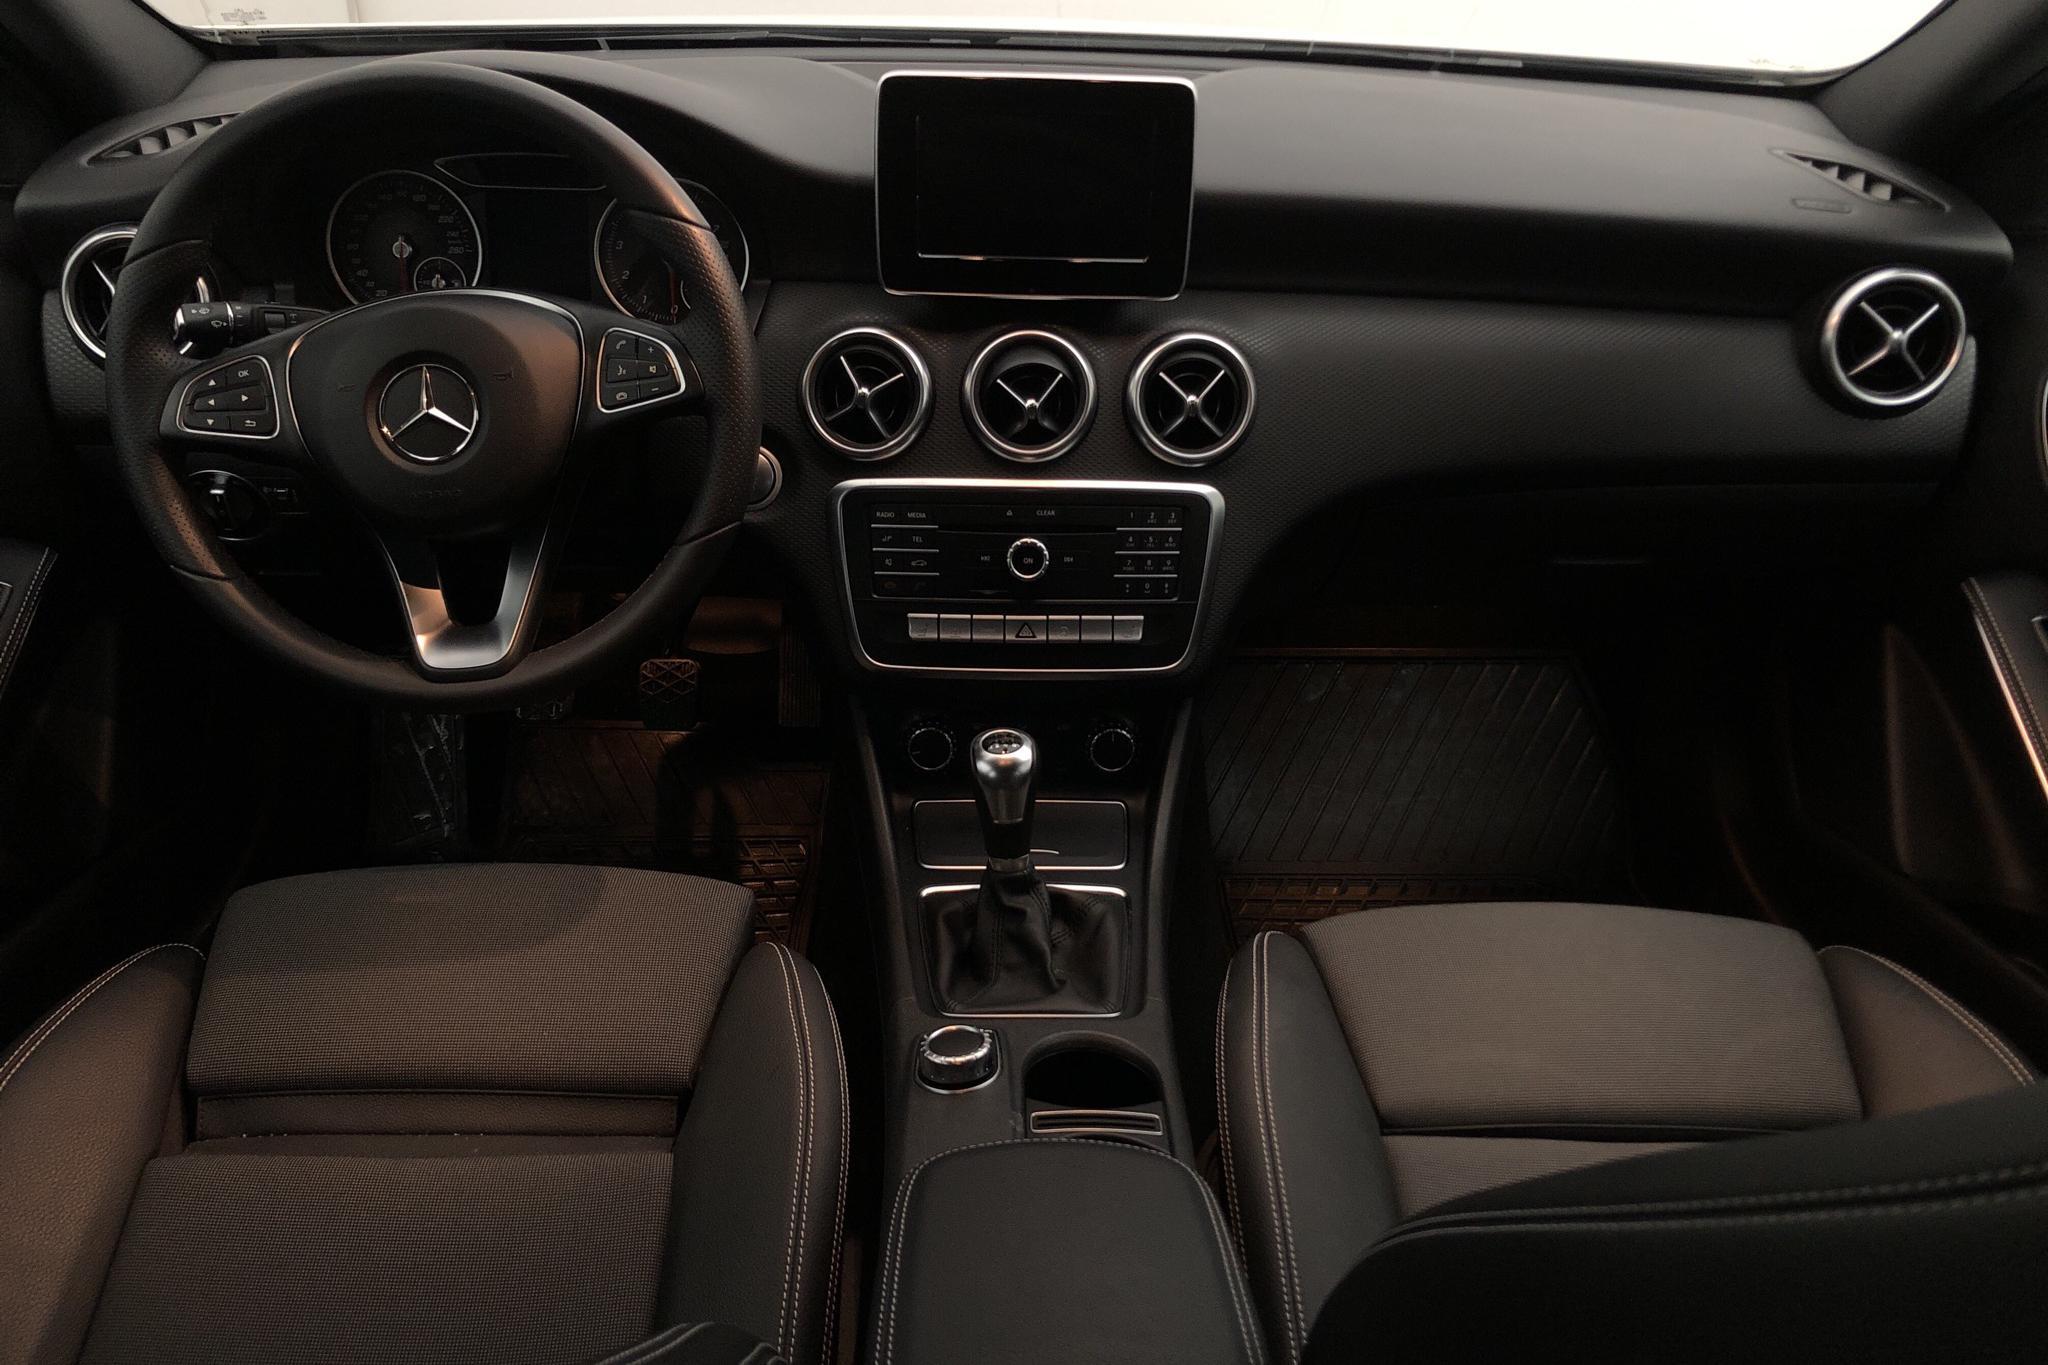 Mercedes A 180 5dr W176 (122hk) - 2 700 mil - Manuell - vit - 2018